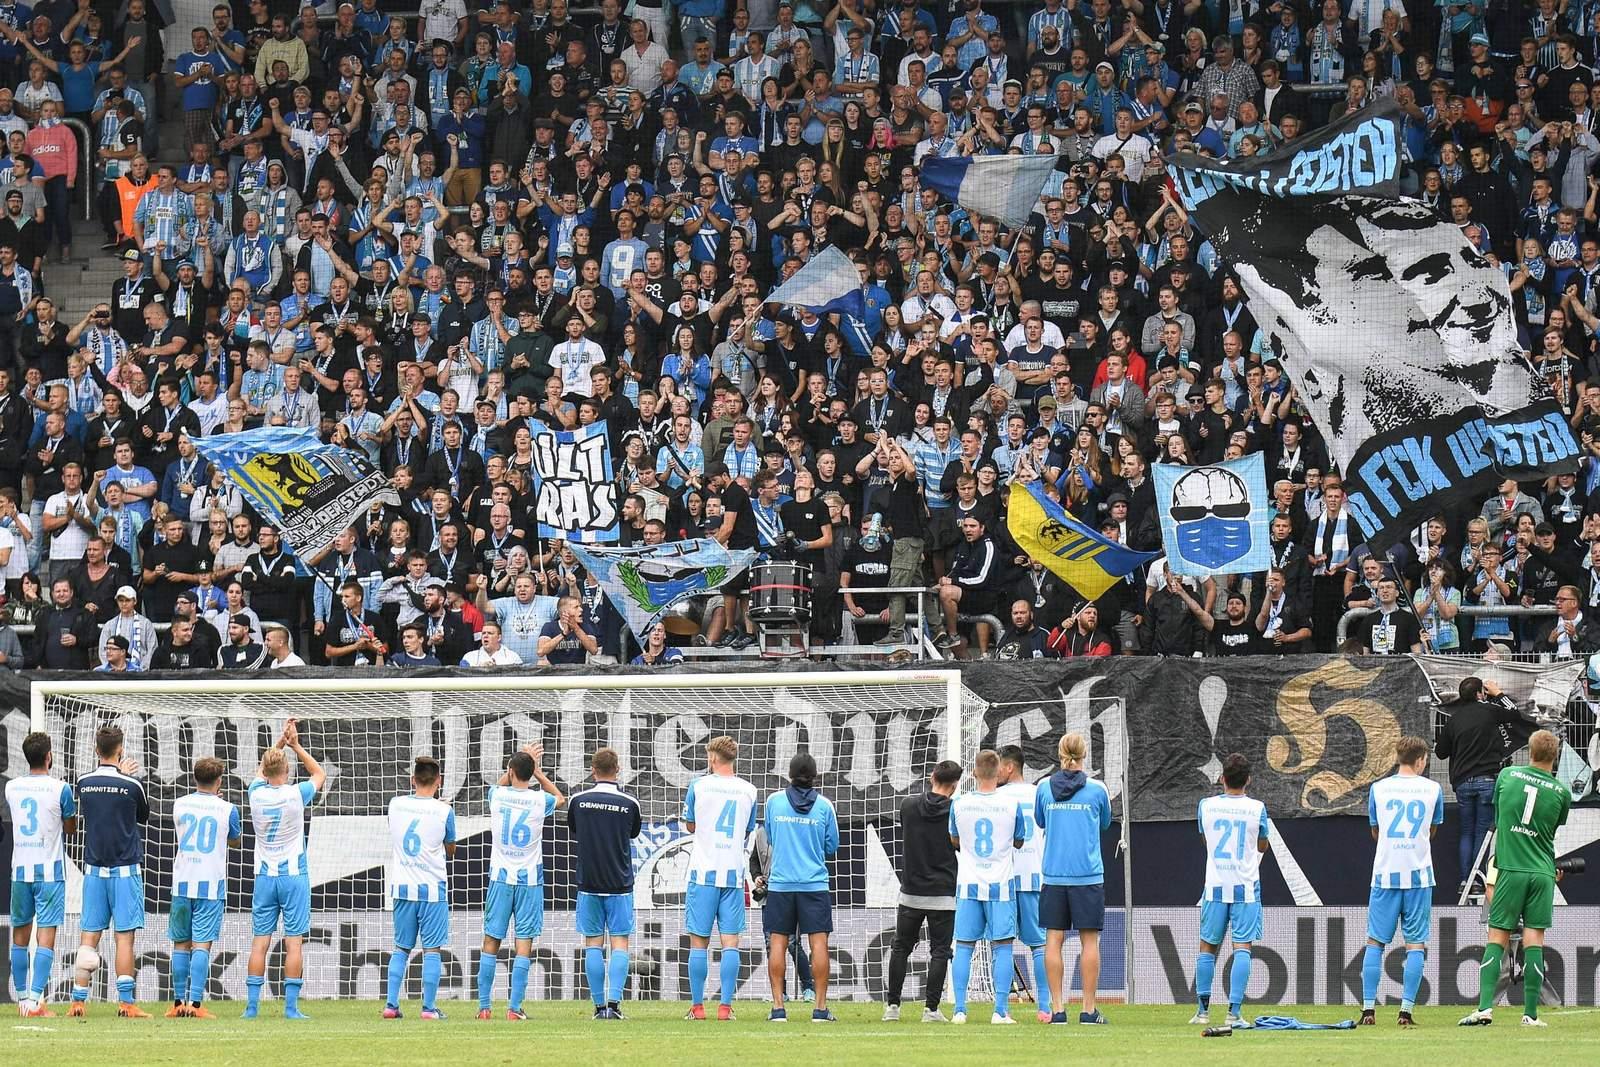 Fans des Chemnitzer FC